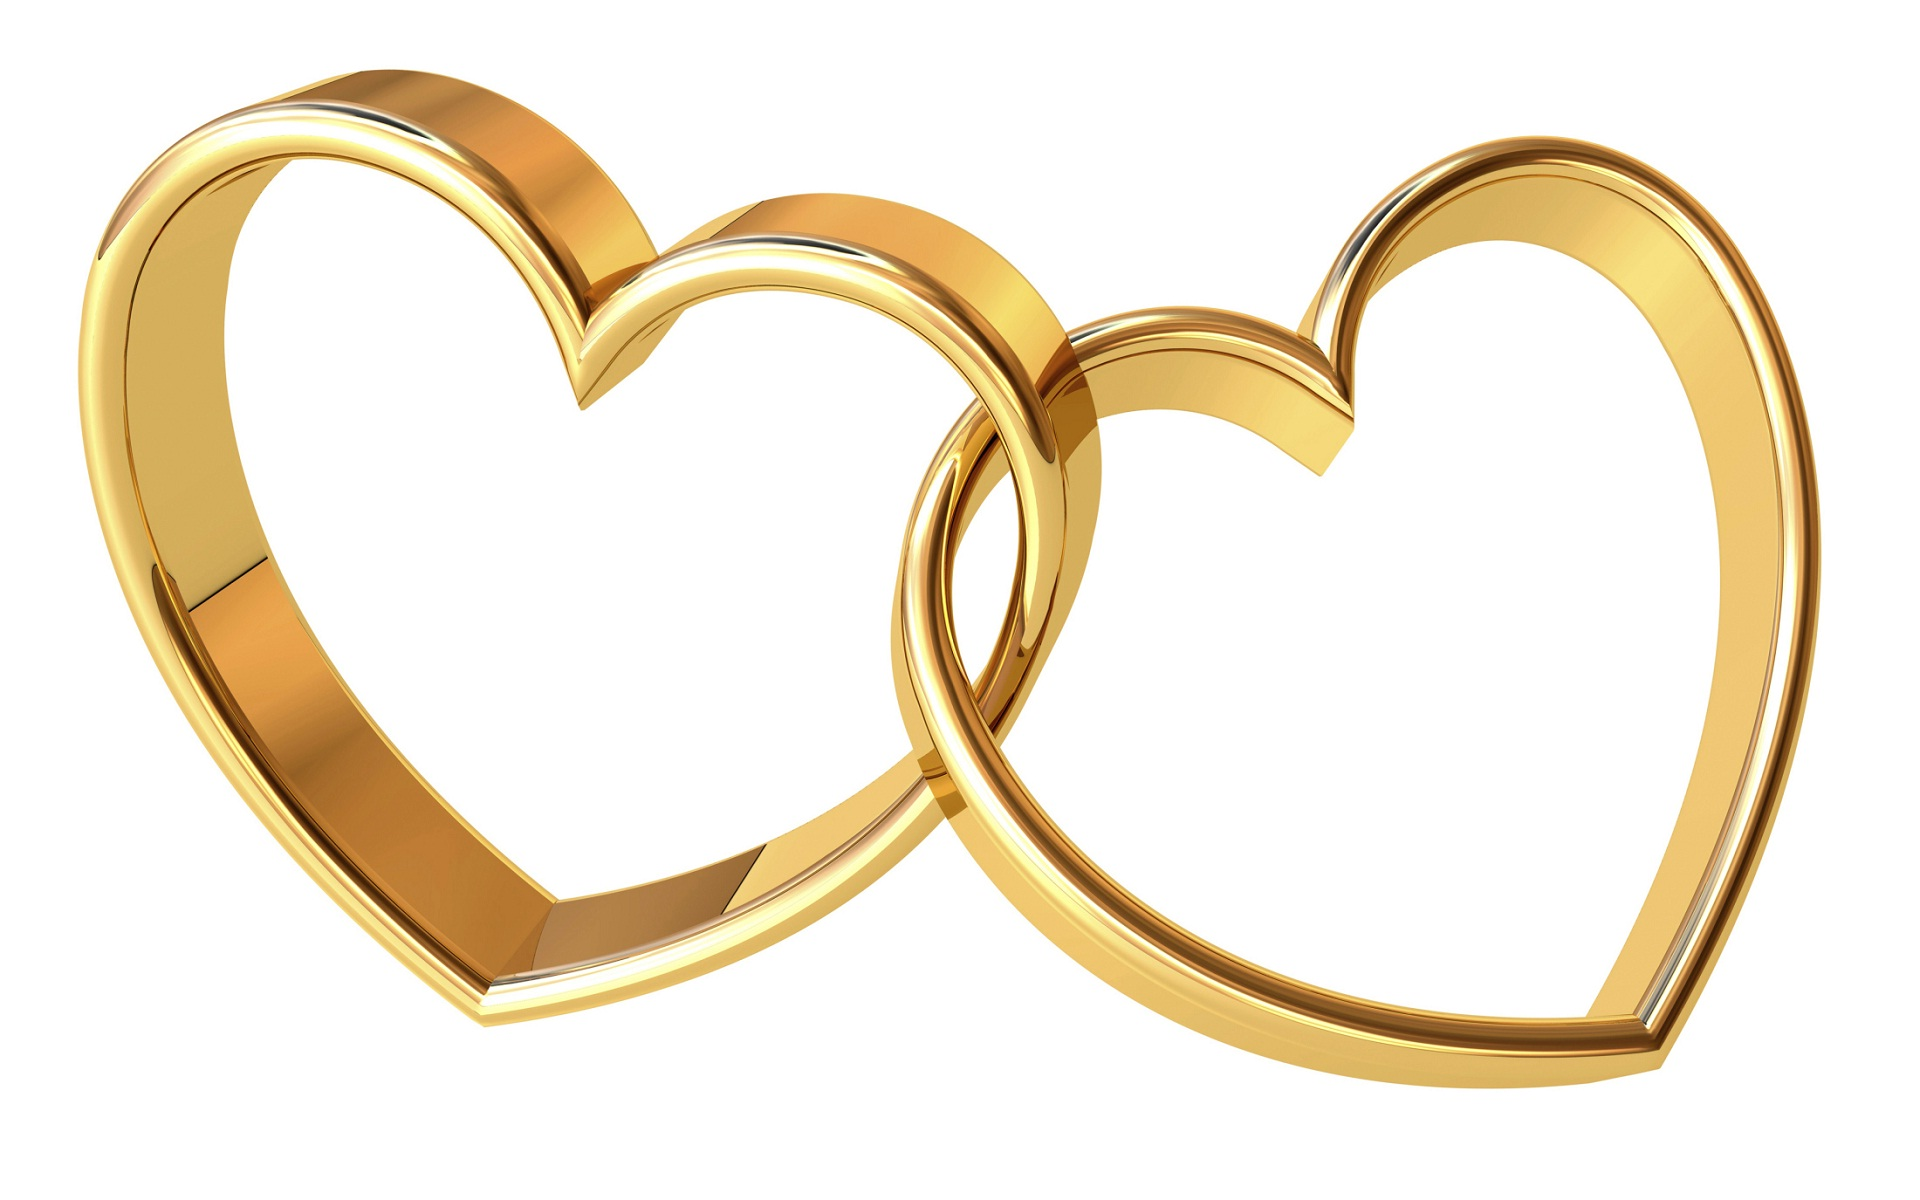 Gold rings heart shape happy anniversary.